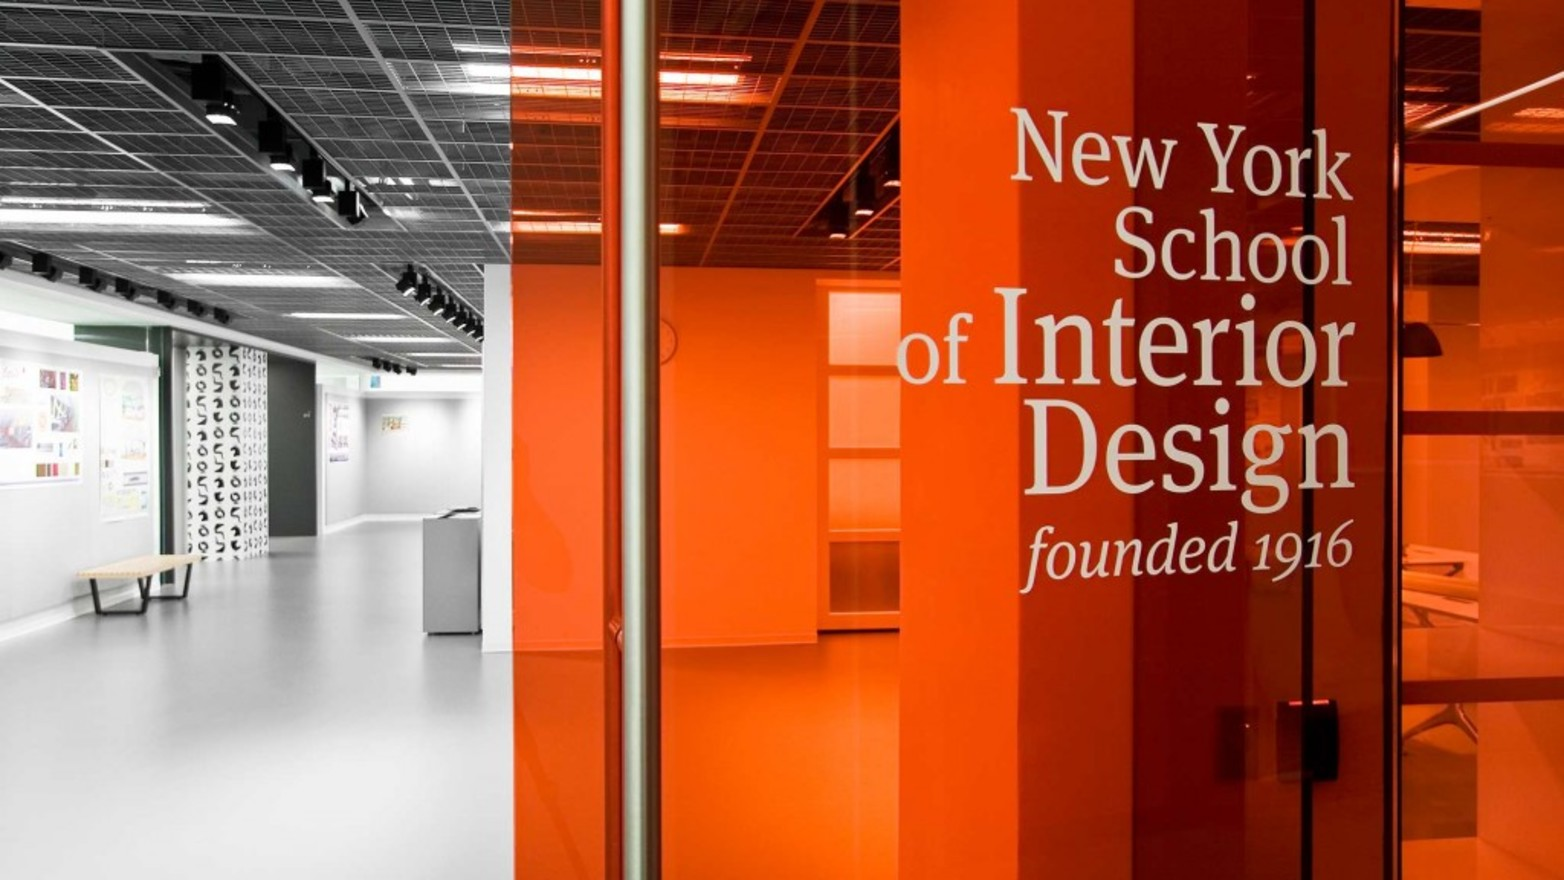 New York School of Interior Design.jpg